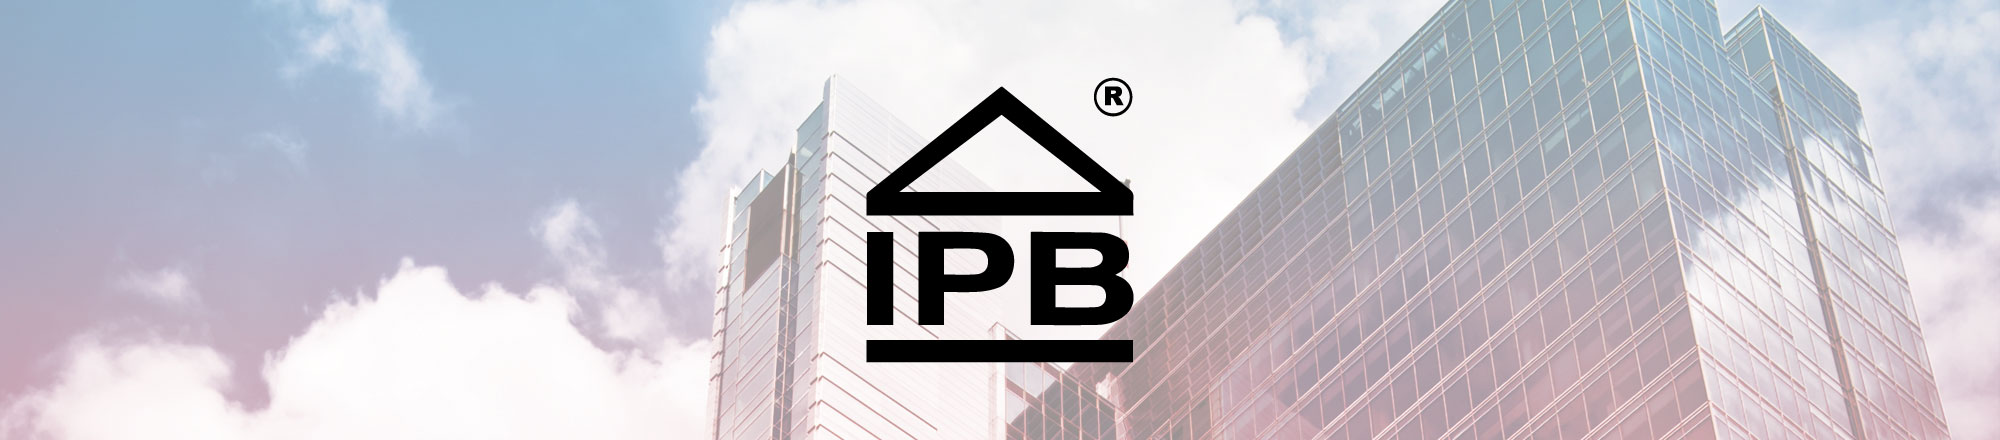 IPB – Izba Projektowania Budowlanego